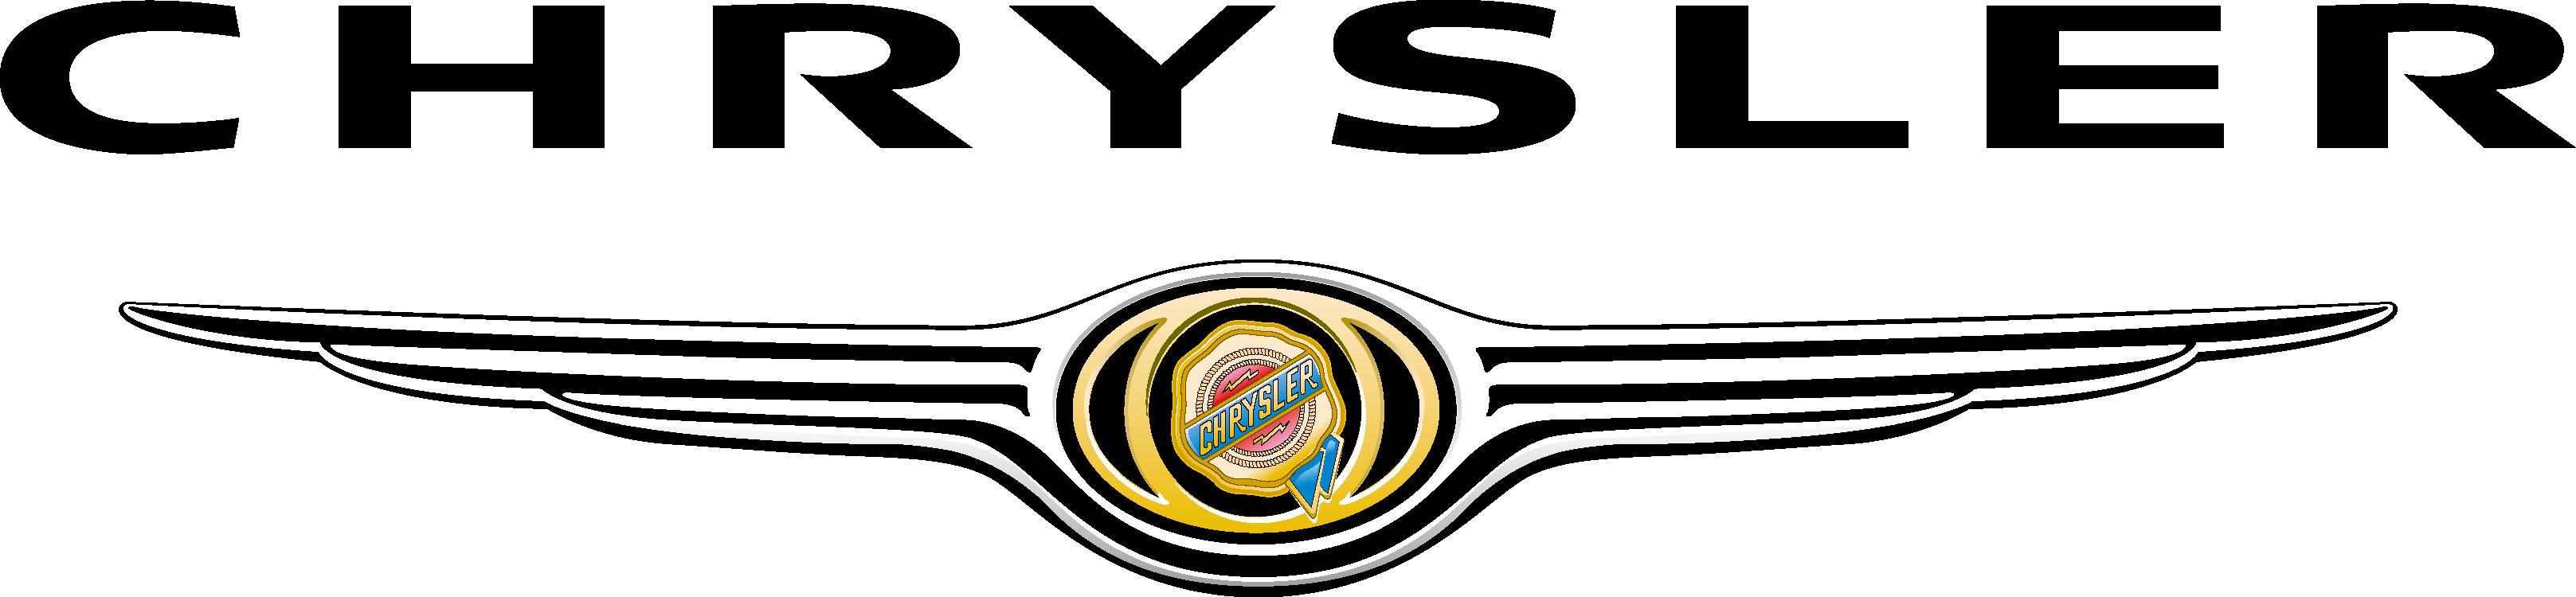 Chrysler Logo Png Image Chrysler Logo Chrysler Logos